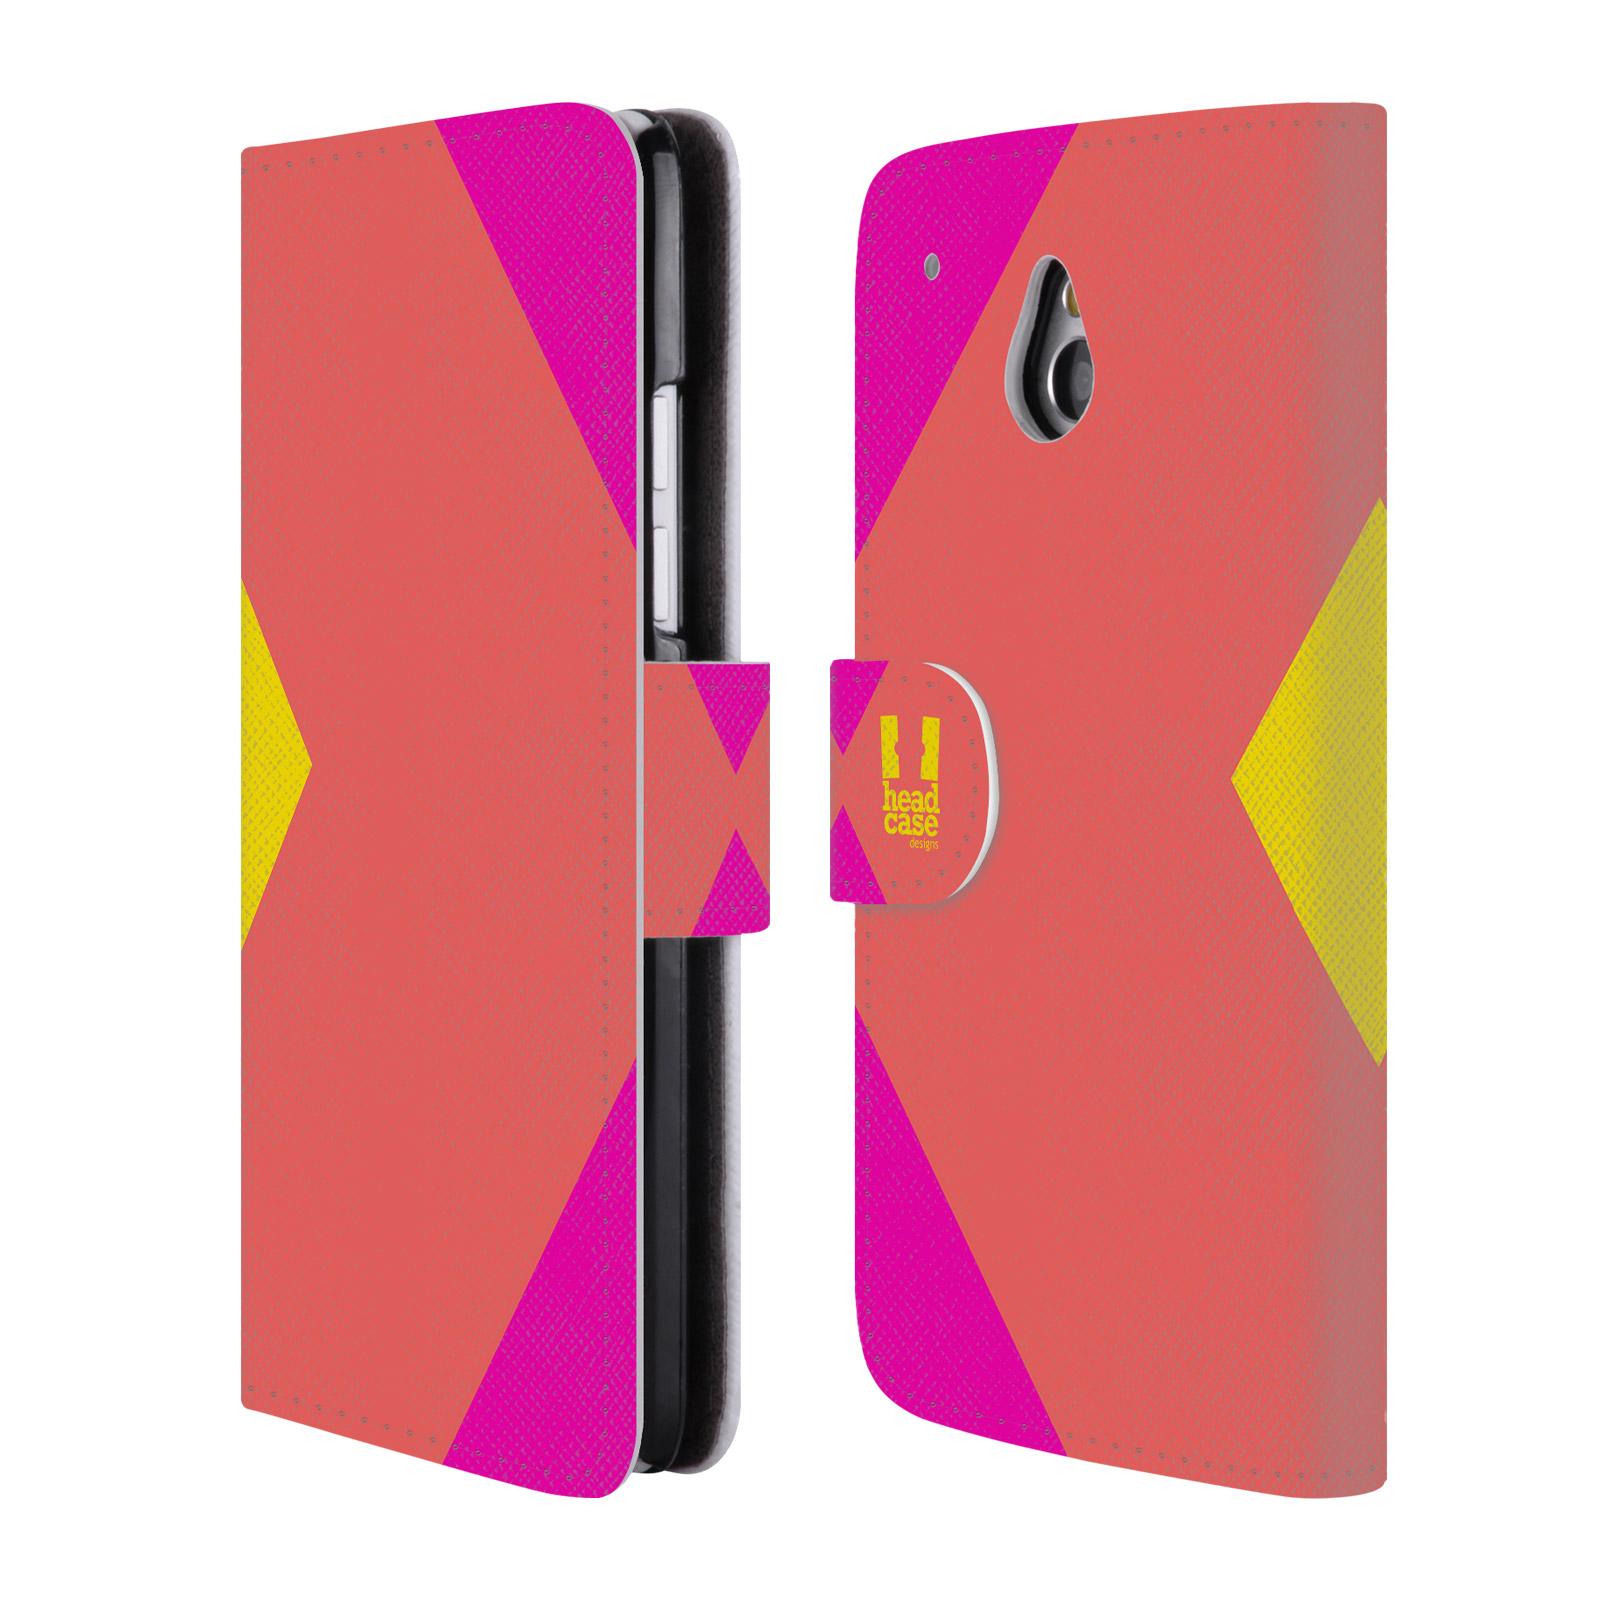 HEAD CASE Flipové pouzdro pro mobil HTC ONE MINI barevné tvary růžová korál